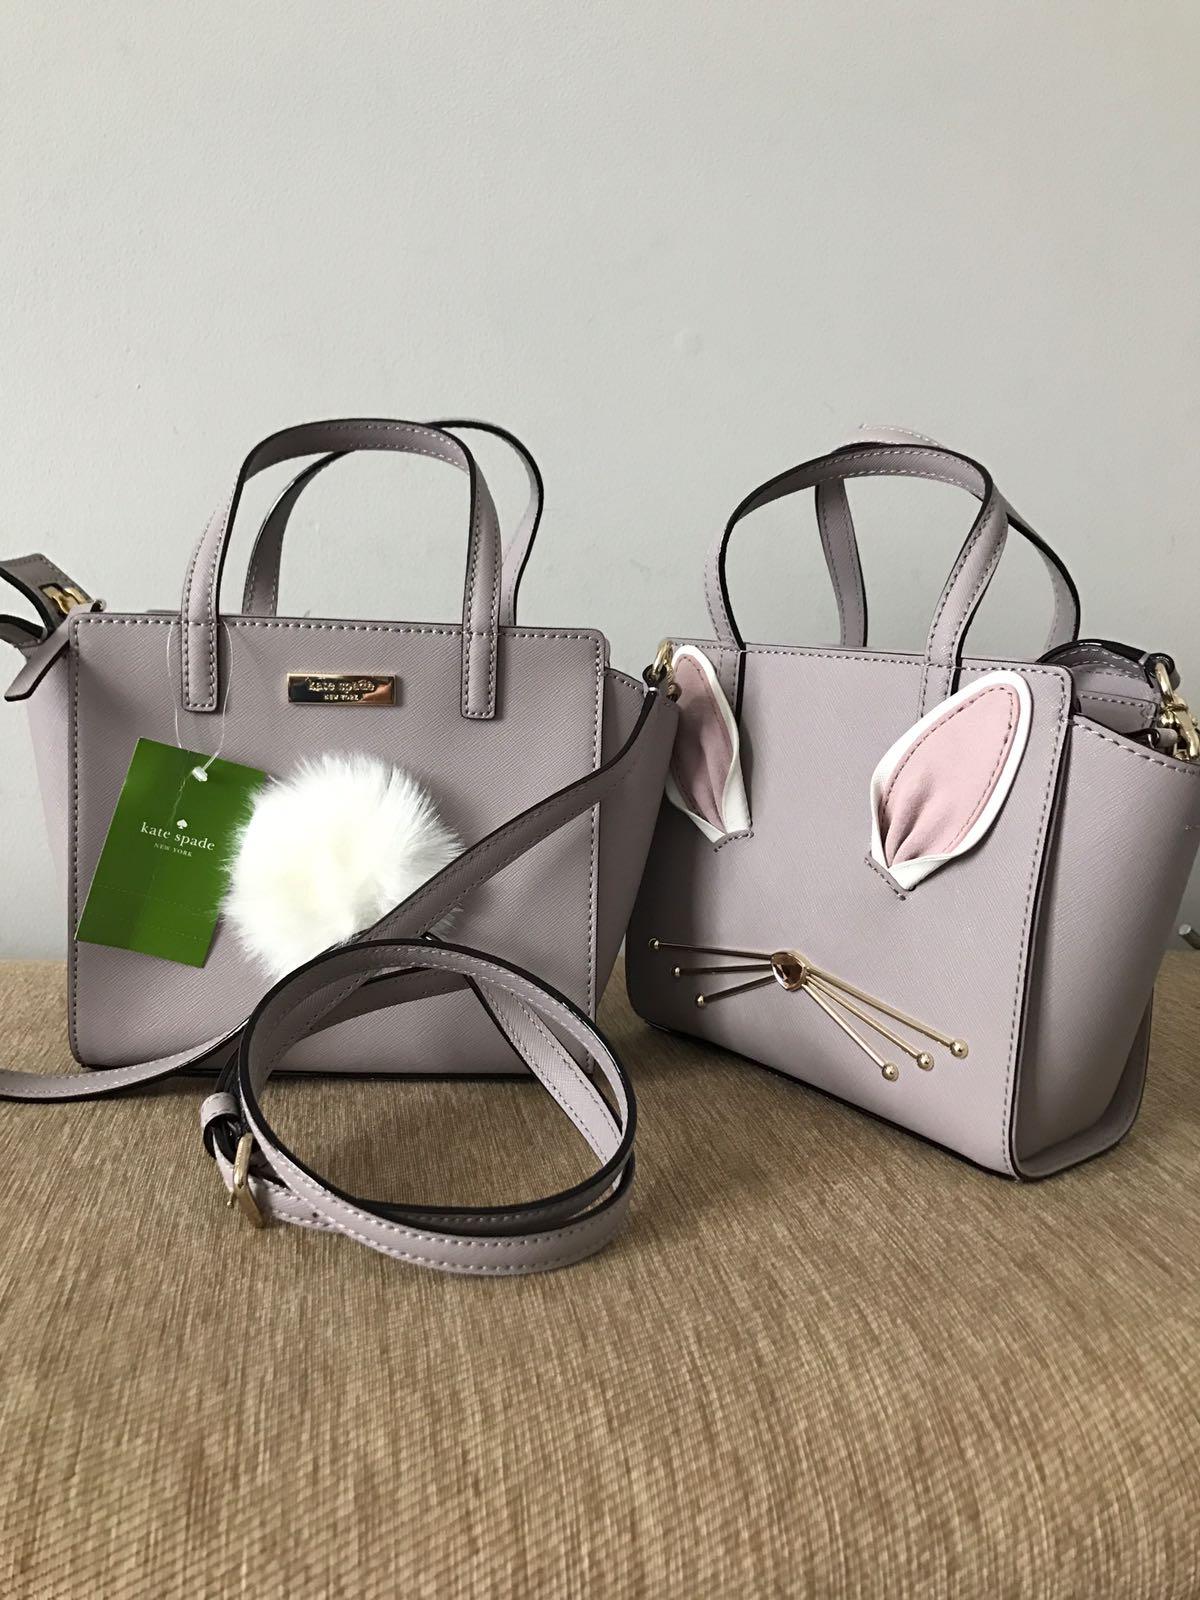 Handbags Kate Spade Mini Hayden Rabbit Hop To It Pink View Detailed Images 4